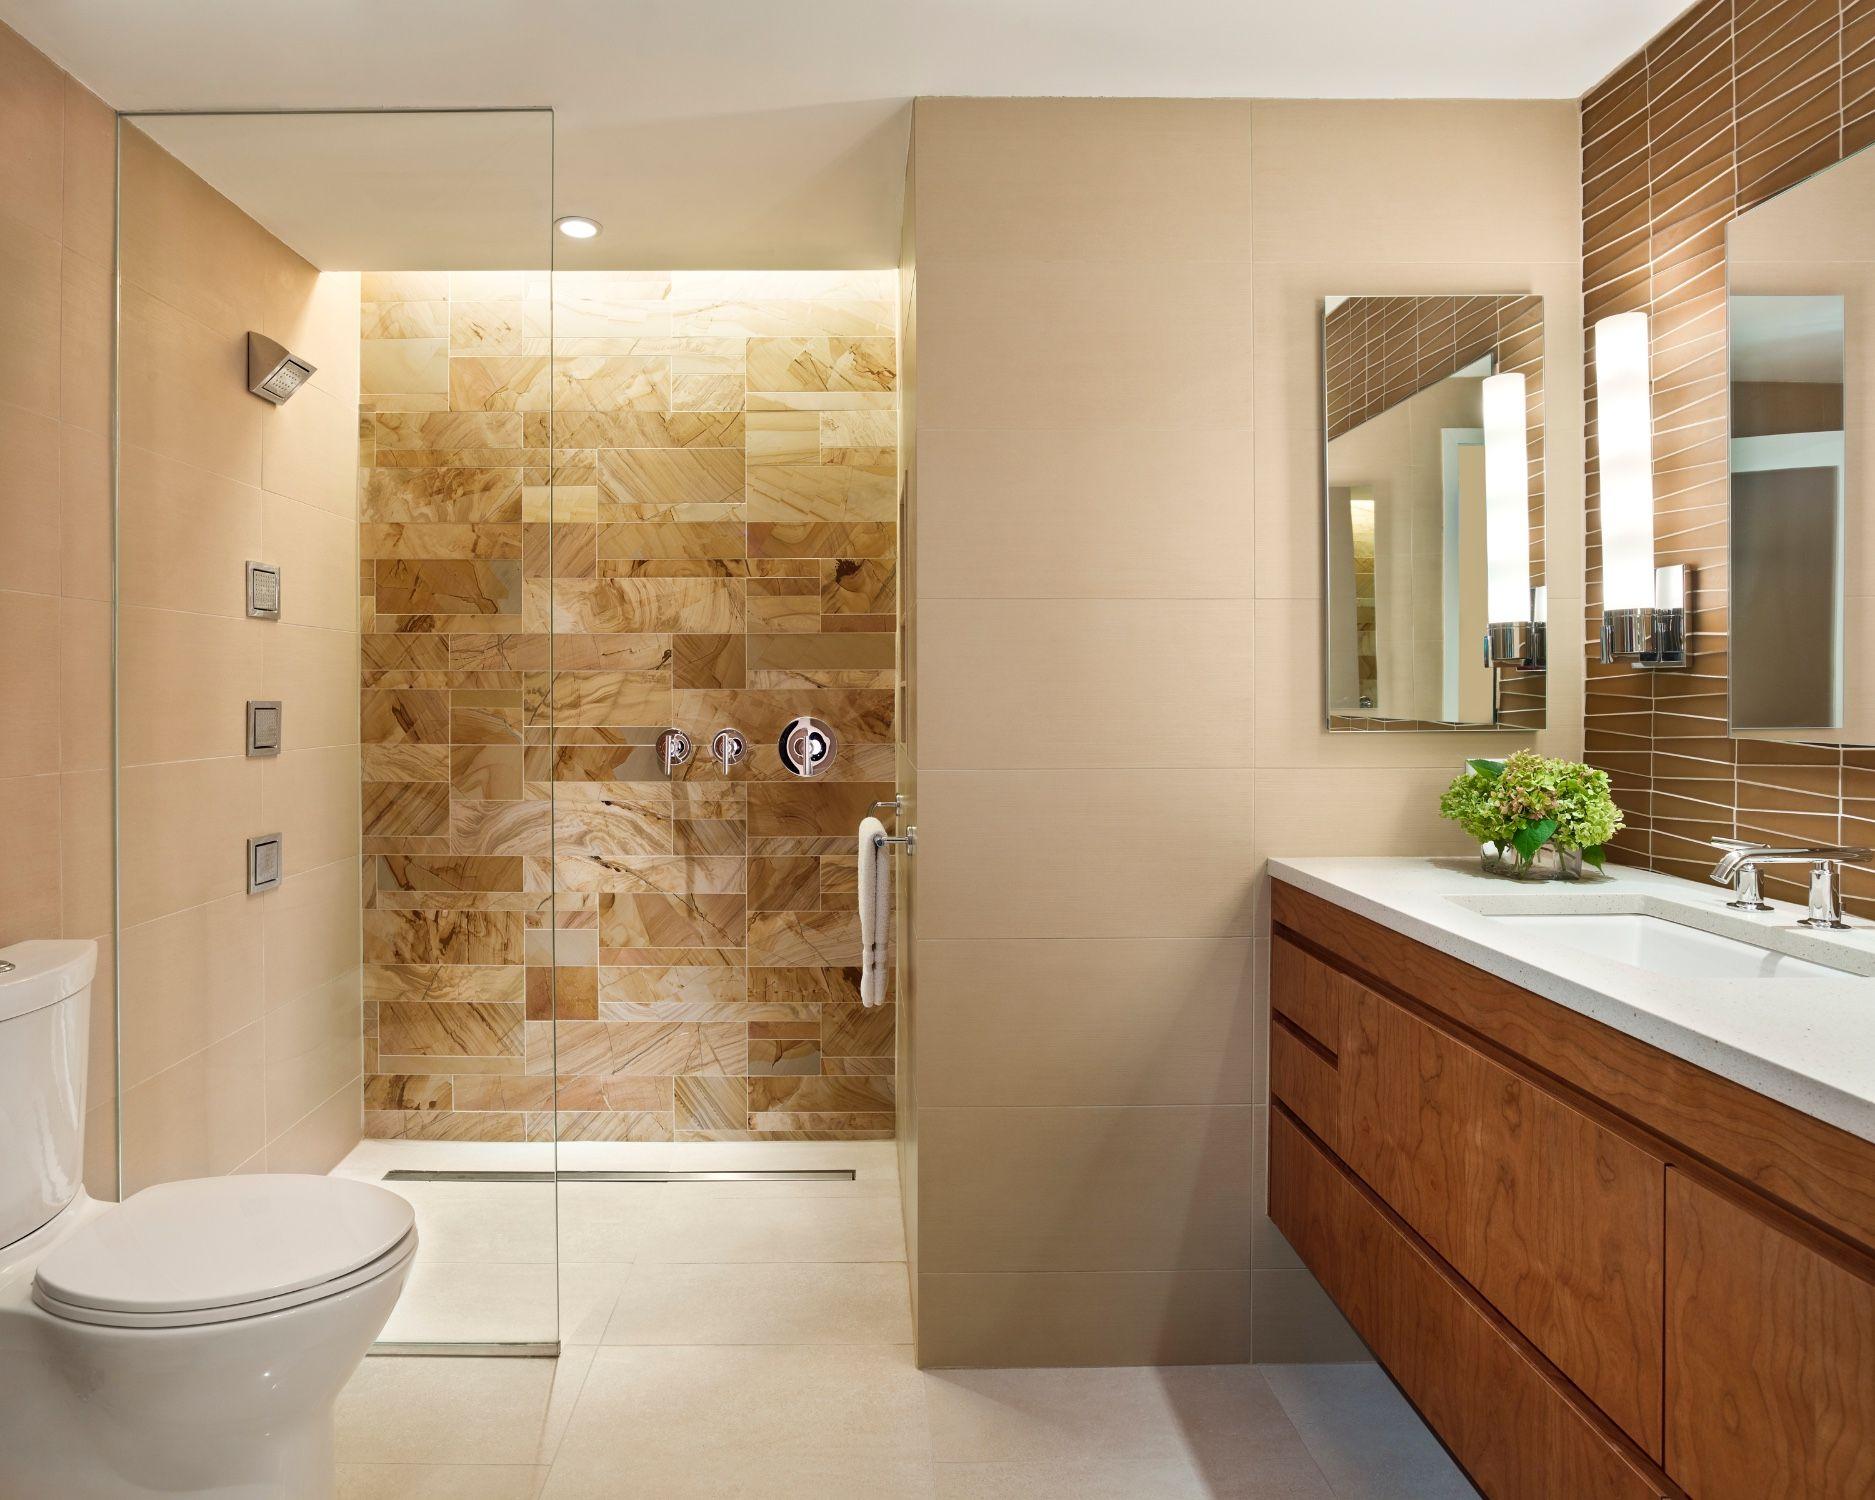 spa feel bathroom designs, spa like bathroom designs, black and white bathroom designs, on zen like bathroom designs